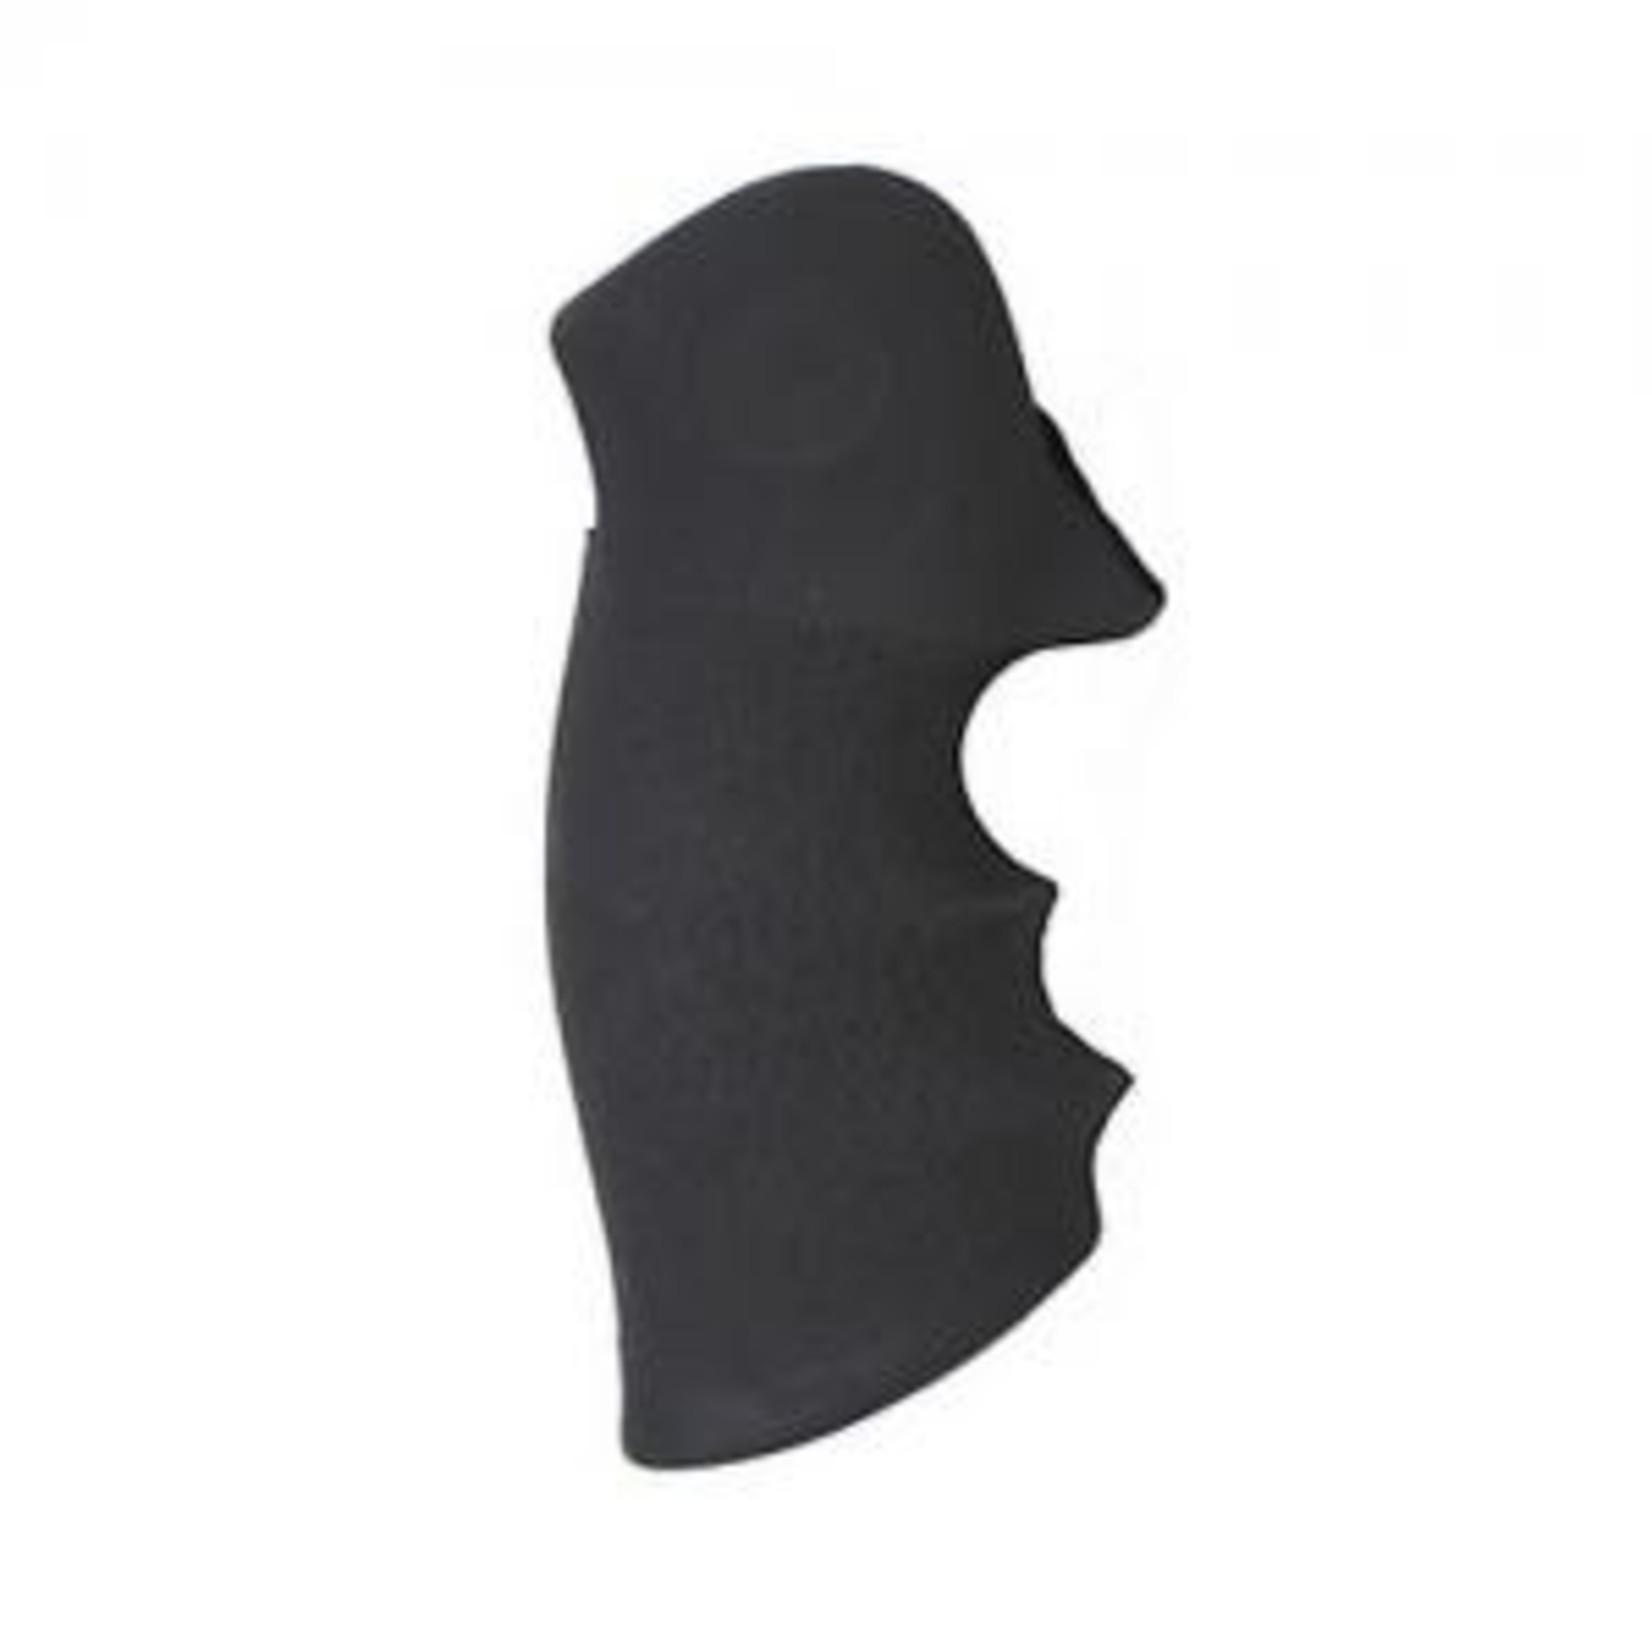 10000 Monogrip Rubber Grips-S&W K L Frame-Sq Butt W/Finger